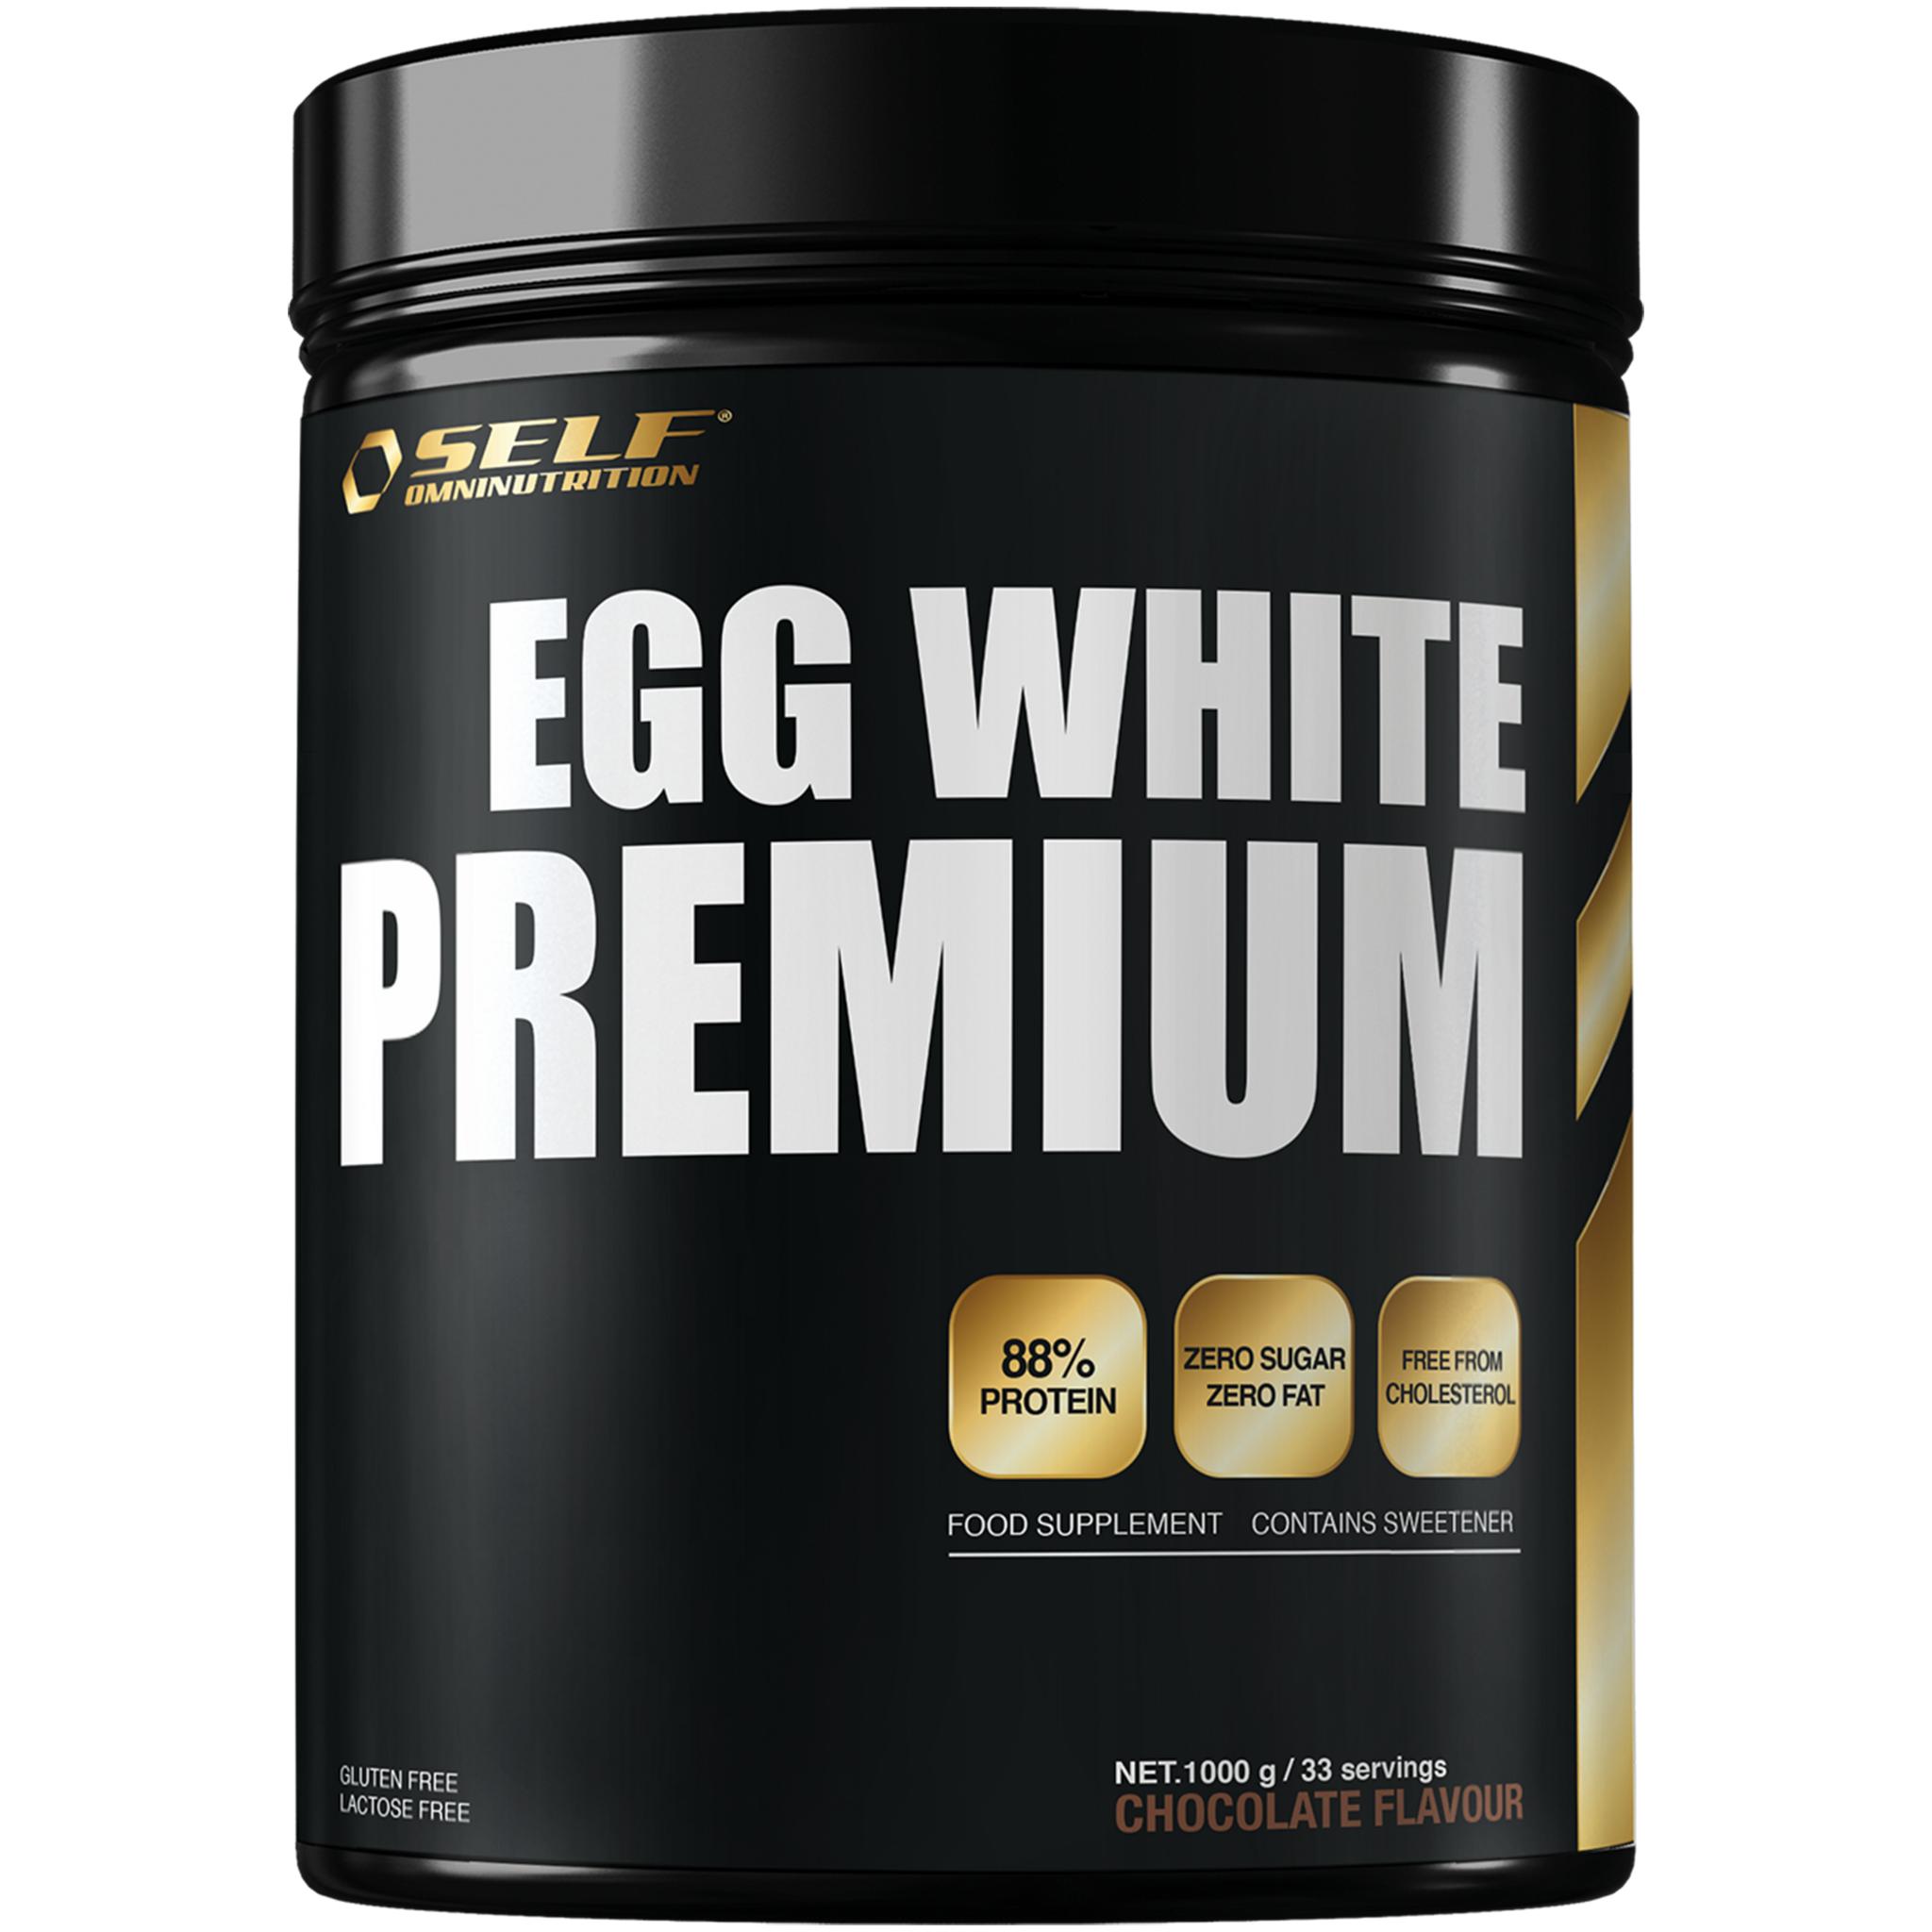 SELF Omninutrition Egg White Premium, proteintilskudd 1000g CHOCOLATE